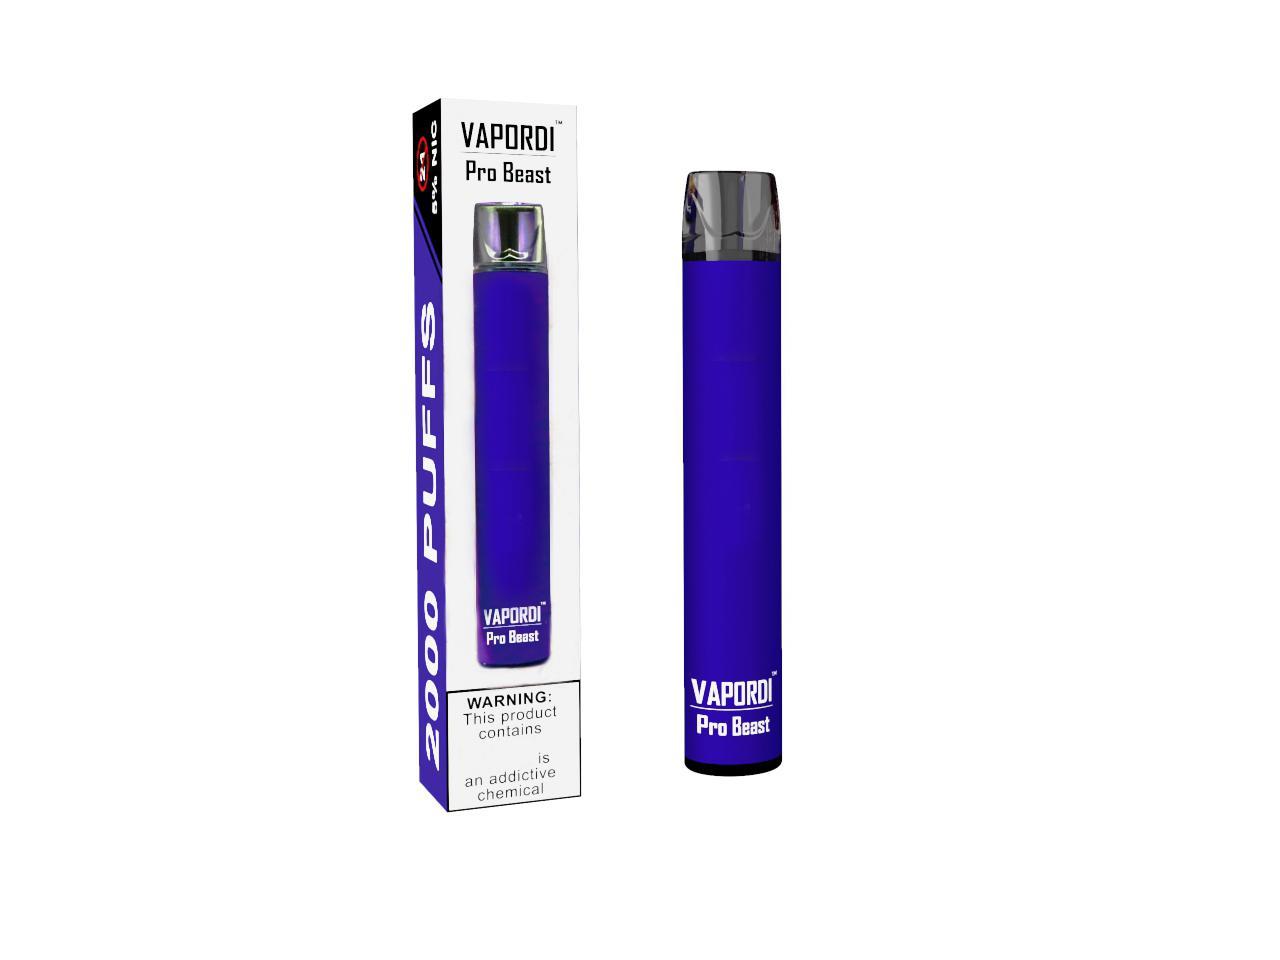 100% originale Vapordi Pro Bestia verifica monouso Pod Kit 18350 Batteria 8.5ml preriempita cartuccia 2000 Puff Vape Svuotare Pen Authentic